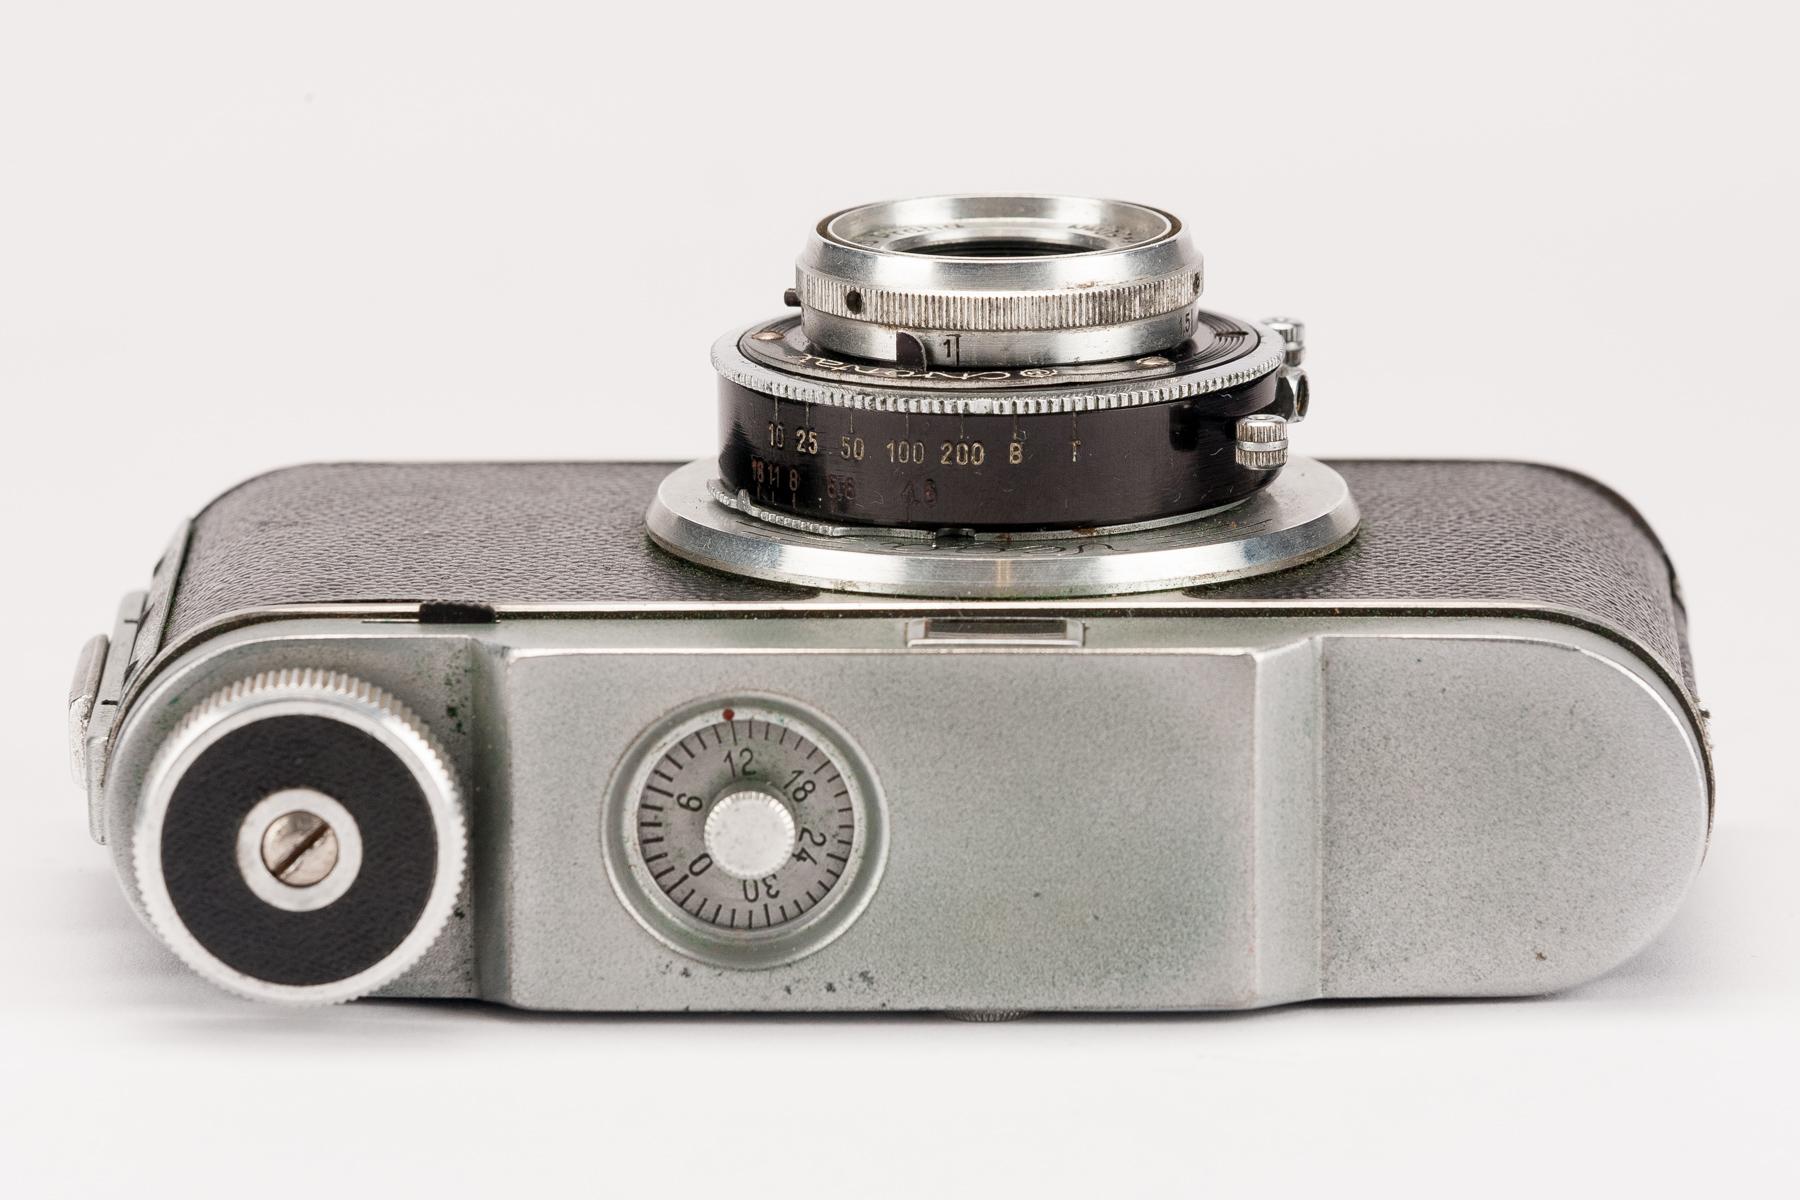 Cnontax Contax Vega Body Gehäuse Kamera mit Druopta Praha 50mm 4.5